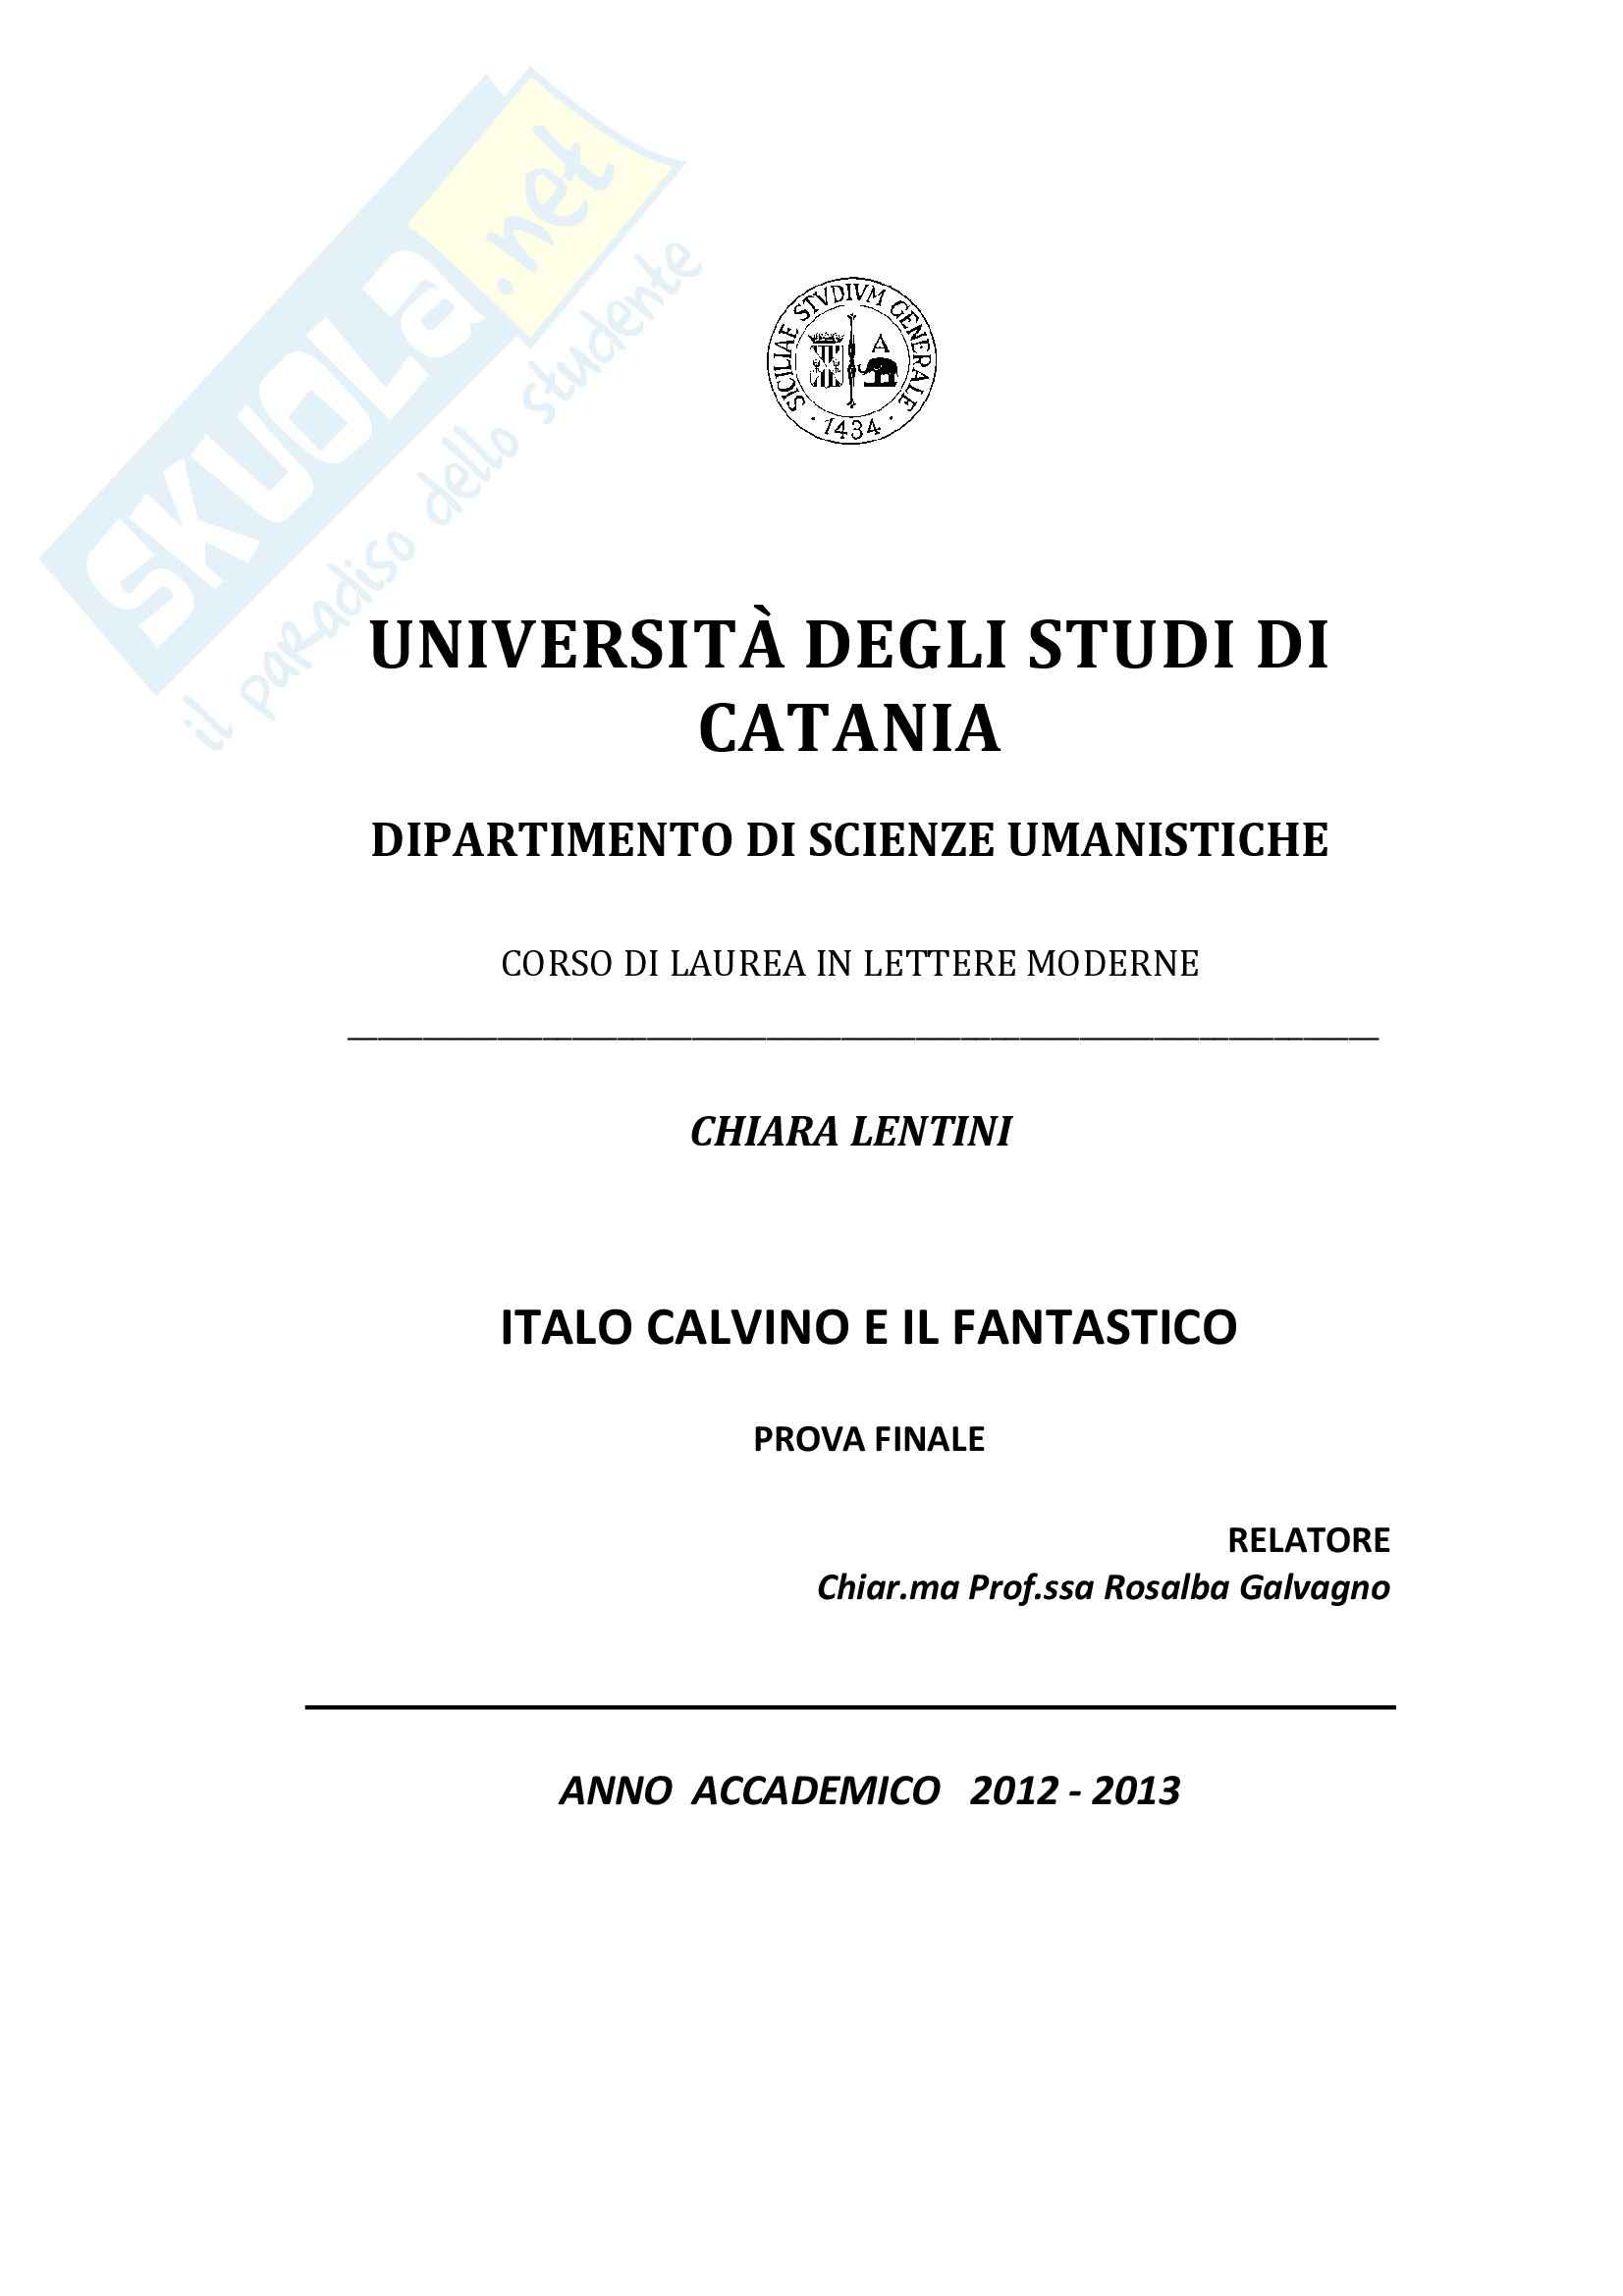 Tesi - Italo Calvino e il fantastico